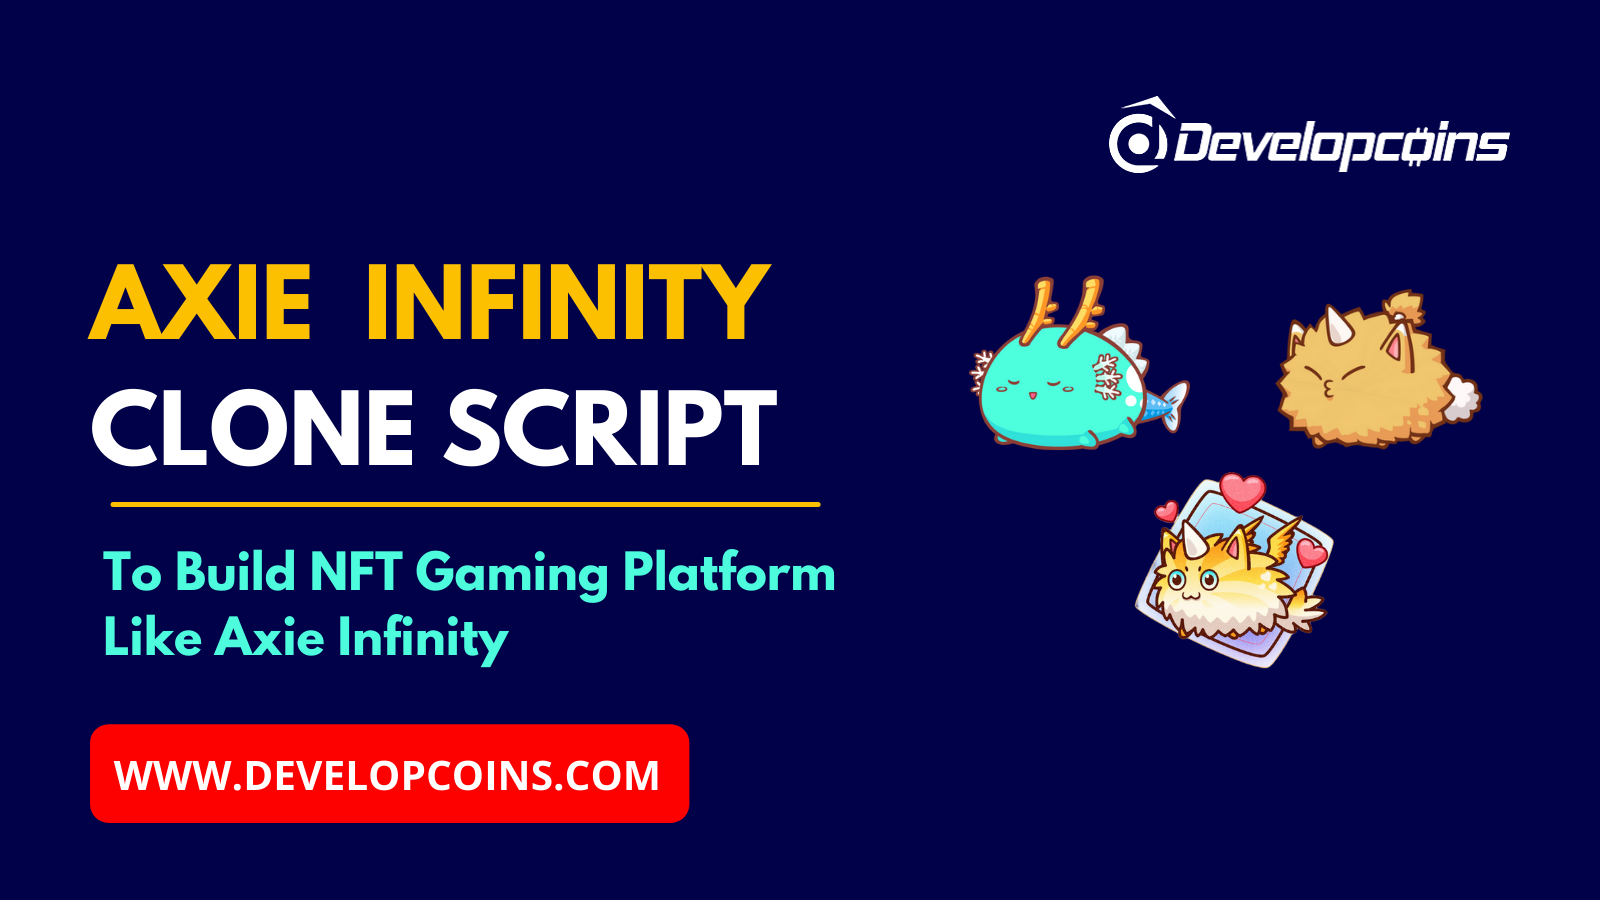 Axie Infinity Clone Script - To Build NFT Gaming Platform Like Axie Infinity